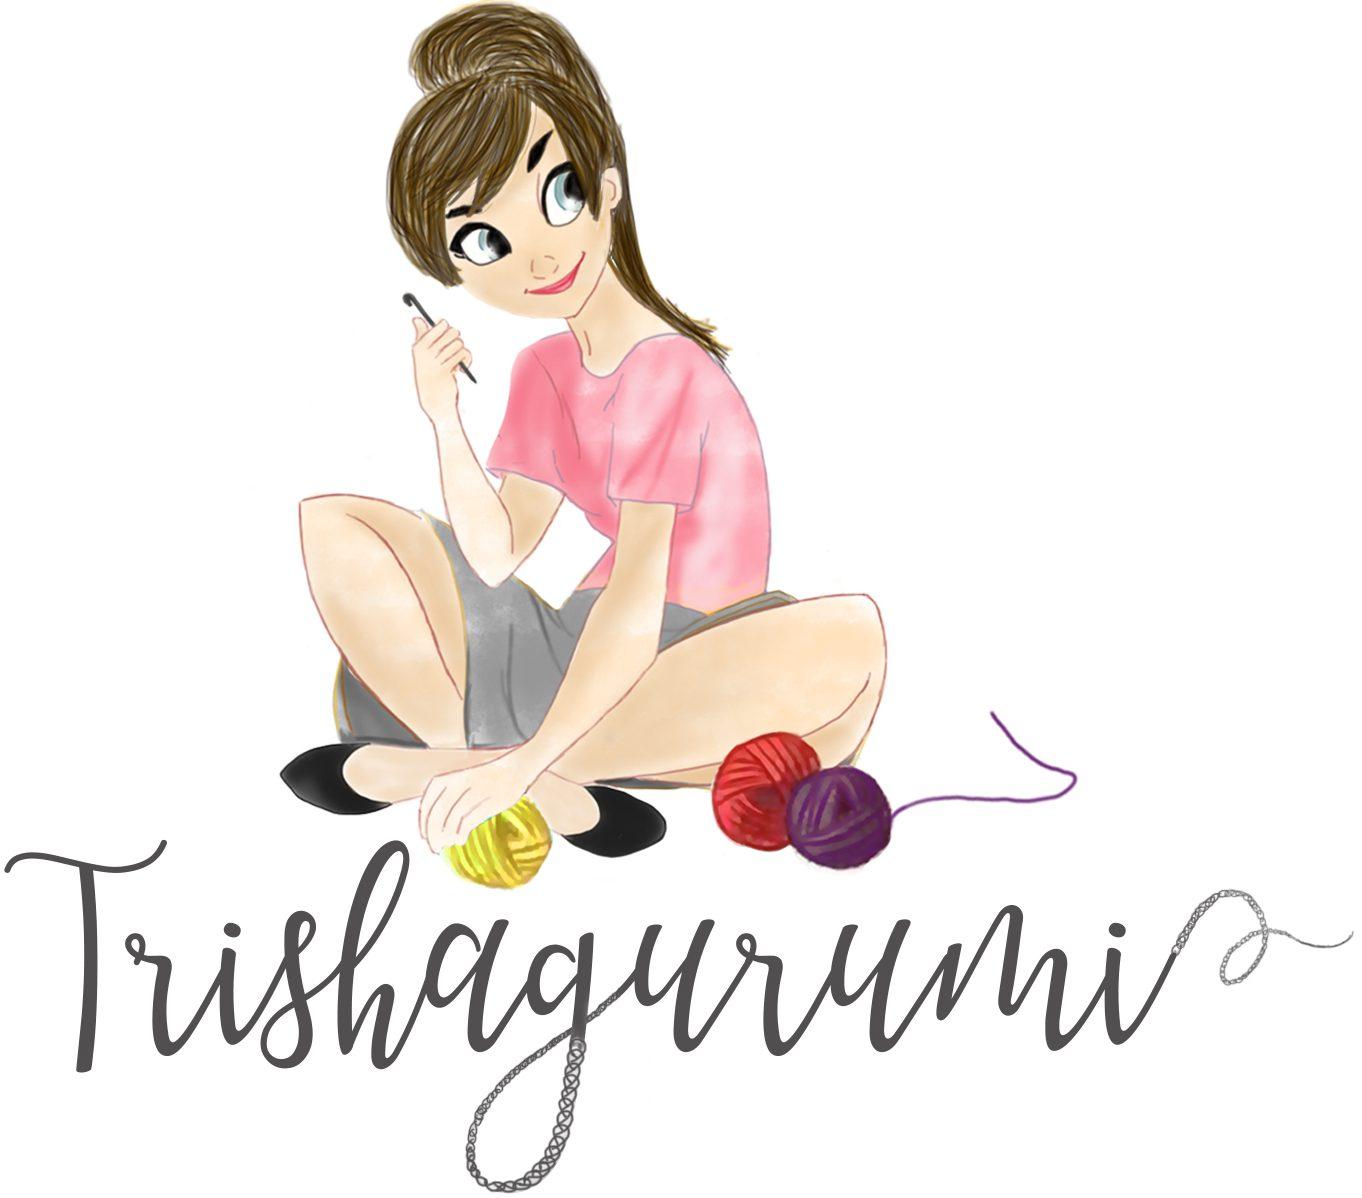 trishagurumi